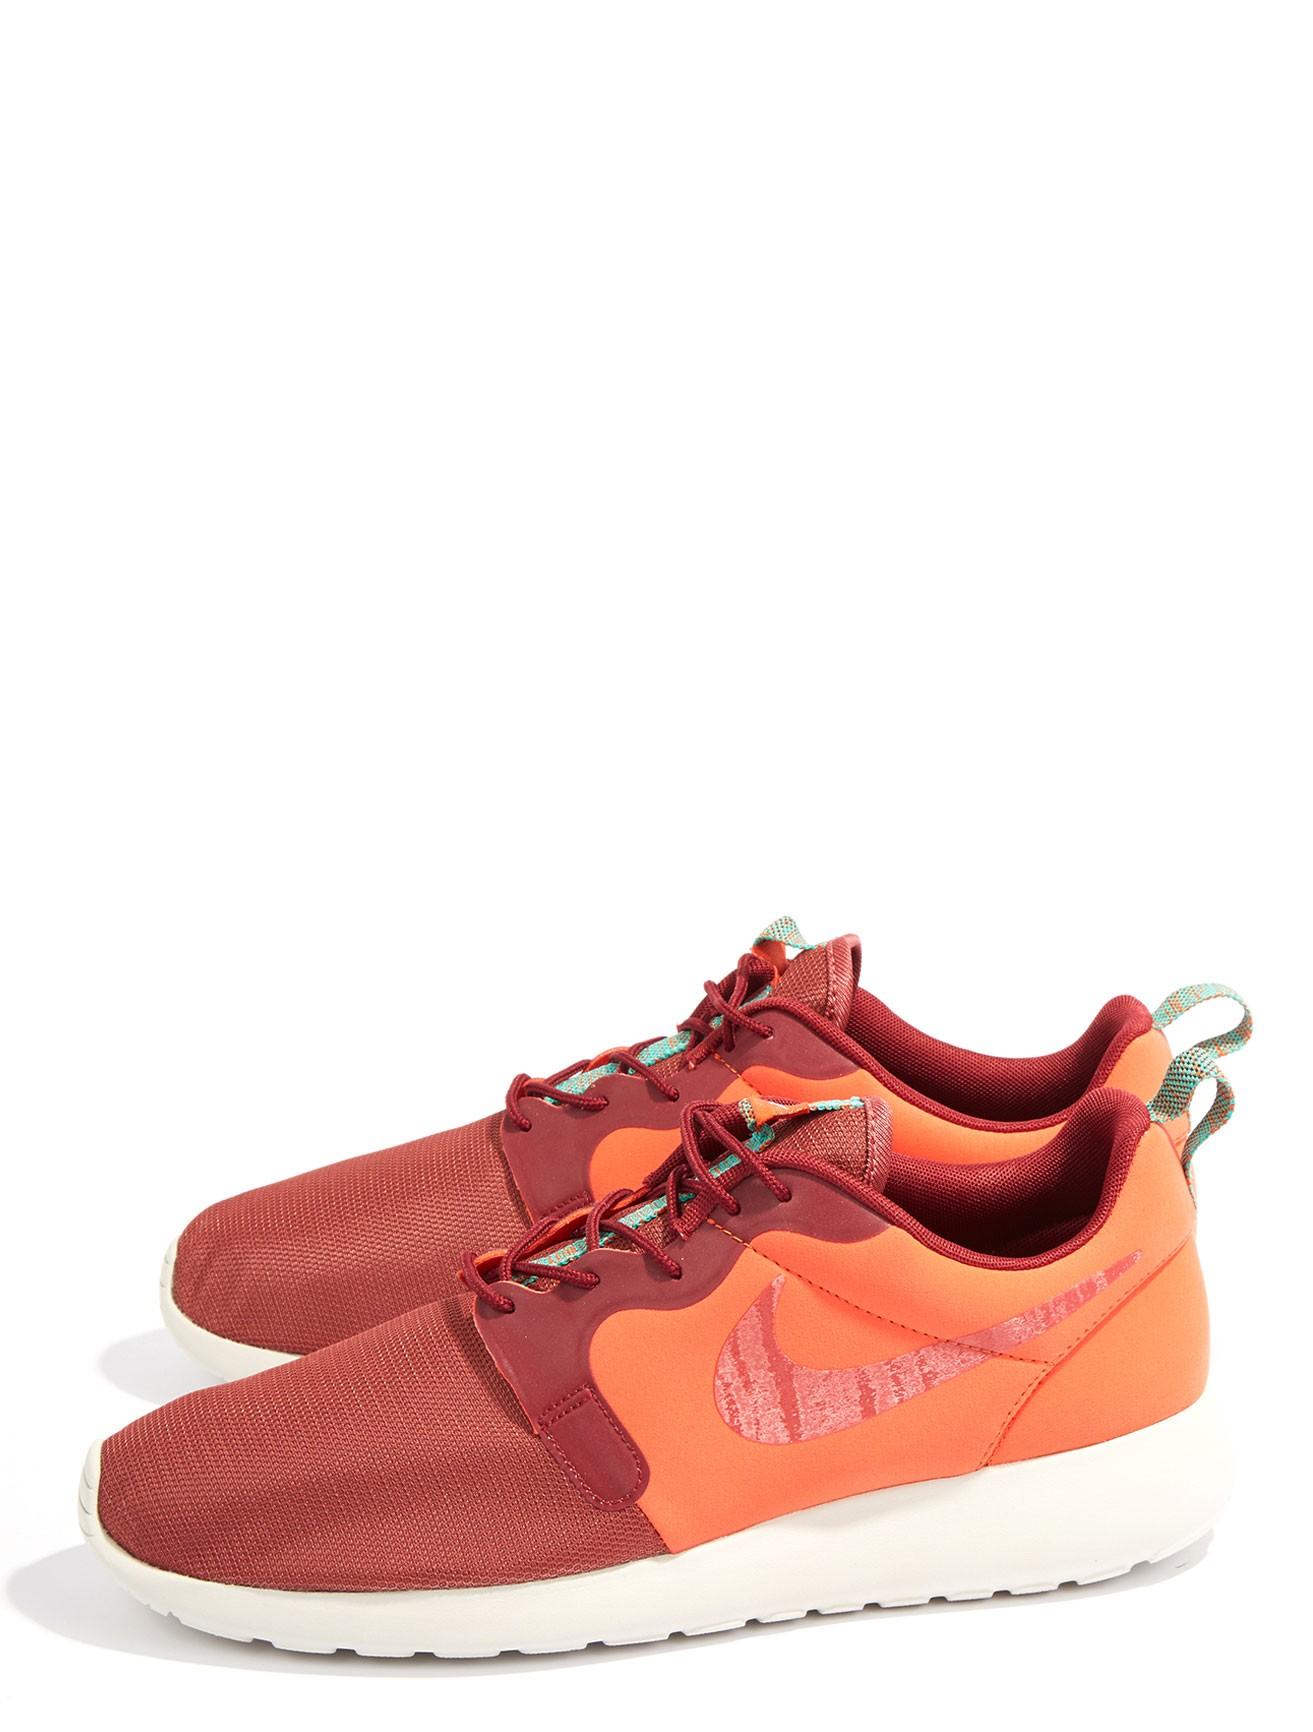 nike roshe run sneakers in orange for men lyst. Black Bedroom Furniture Sets. Home Design Ideas